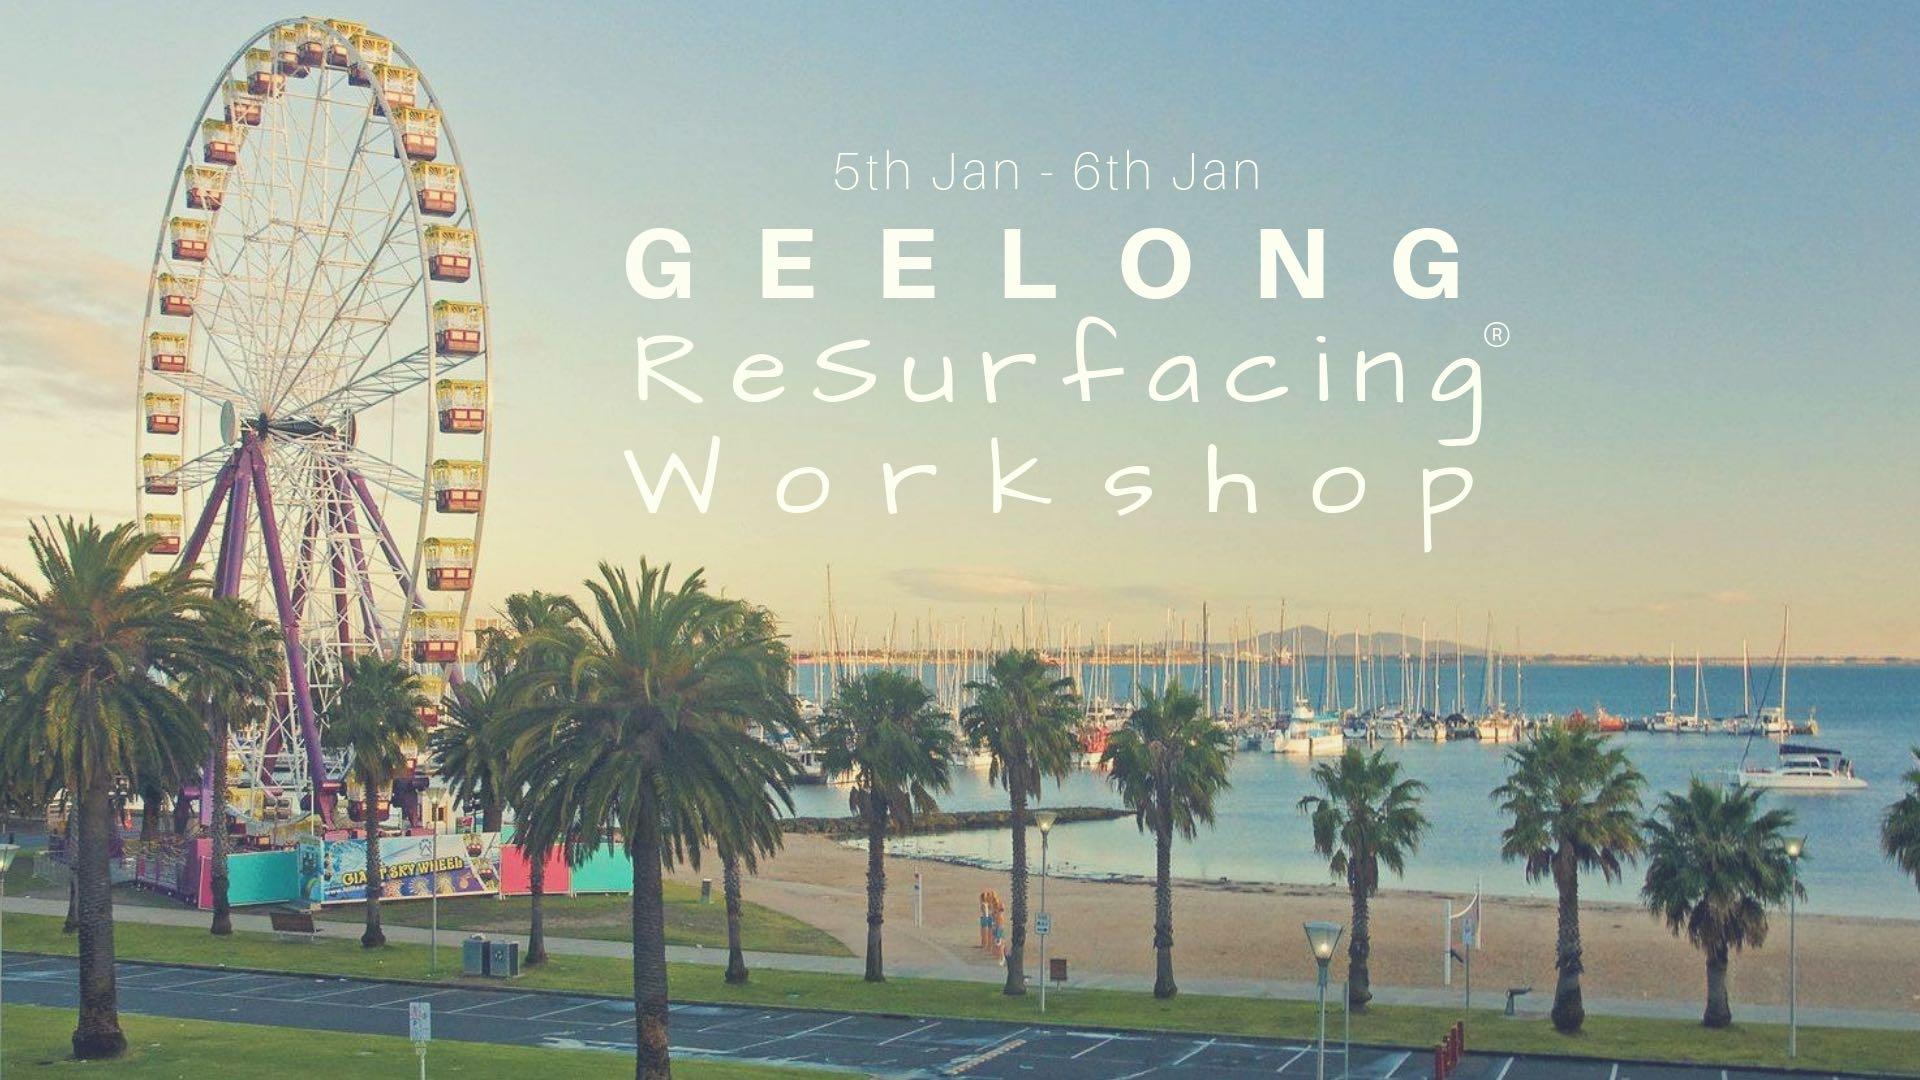 Geelong ReSurf 5-6 Jan 2019